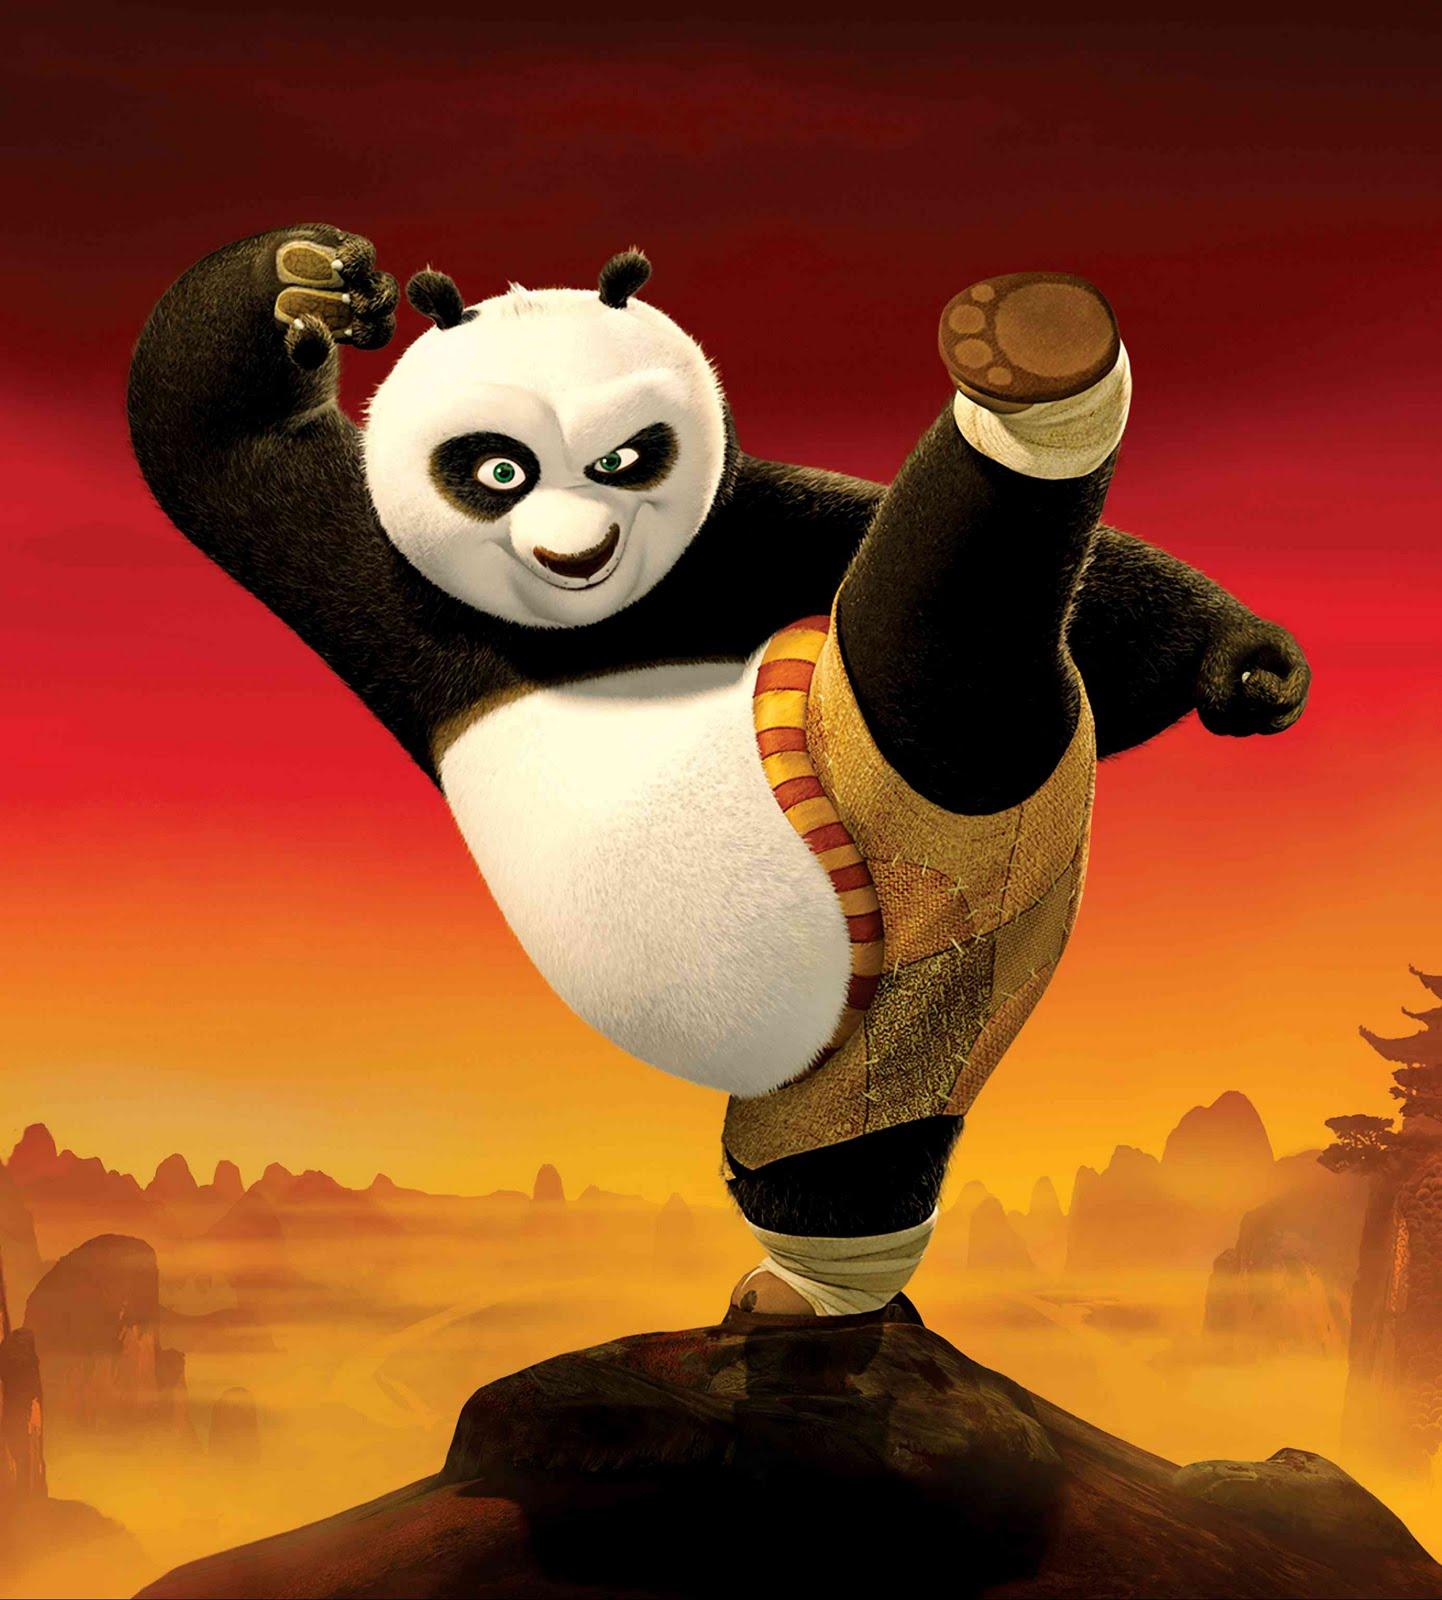 http://1.bp.blogspot.com/-H96sXBDO8I4/TjAtpN7iQWI/AAAAAAAAACY/X41__h2SPWI/s1600/Po-Kung-Fu-Panda-wallpaper.jpg